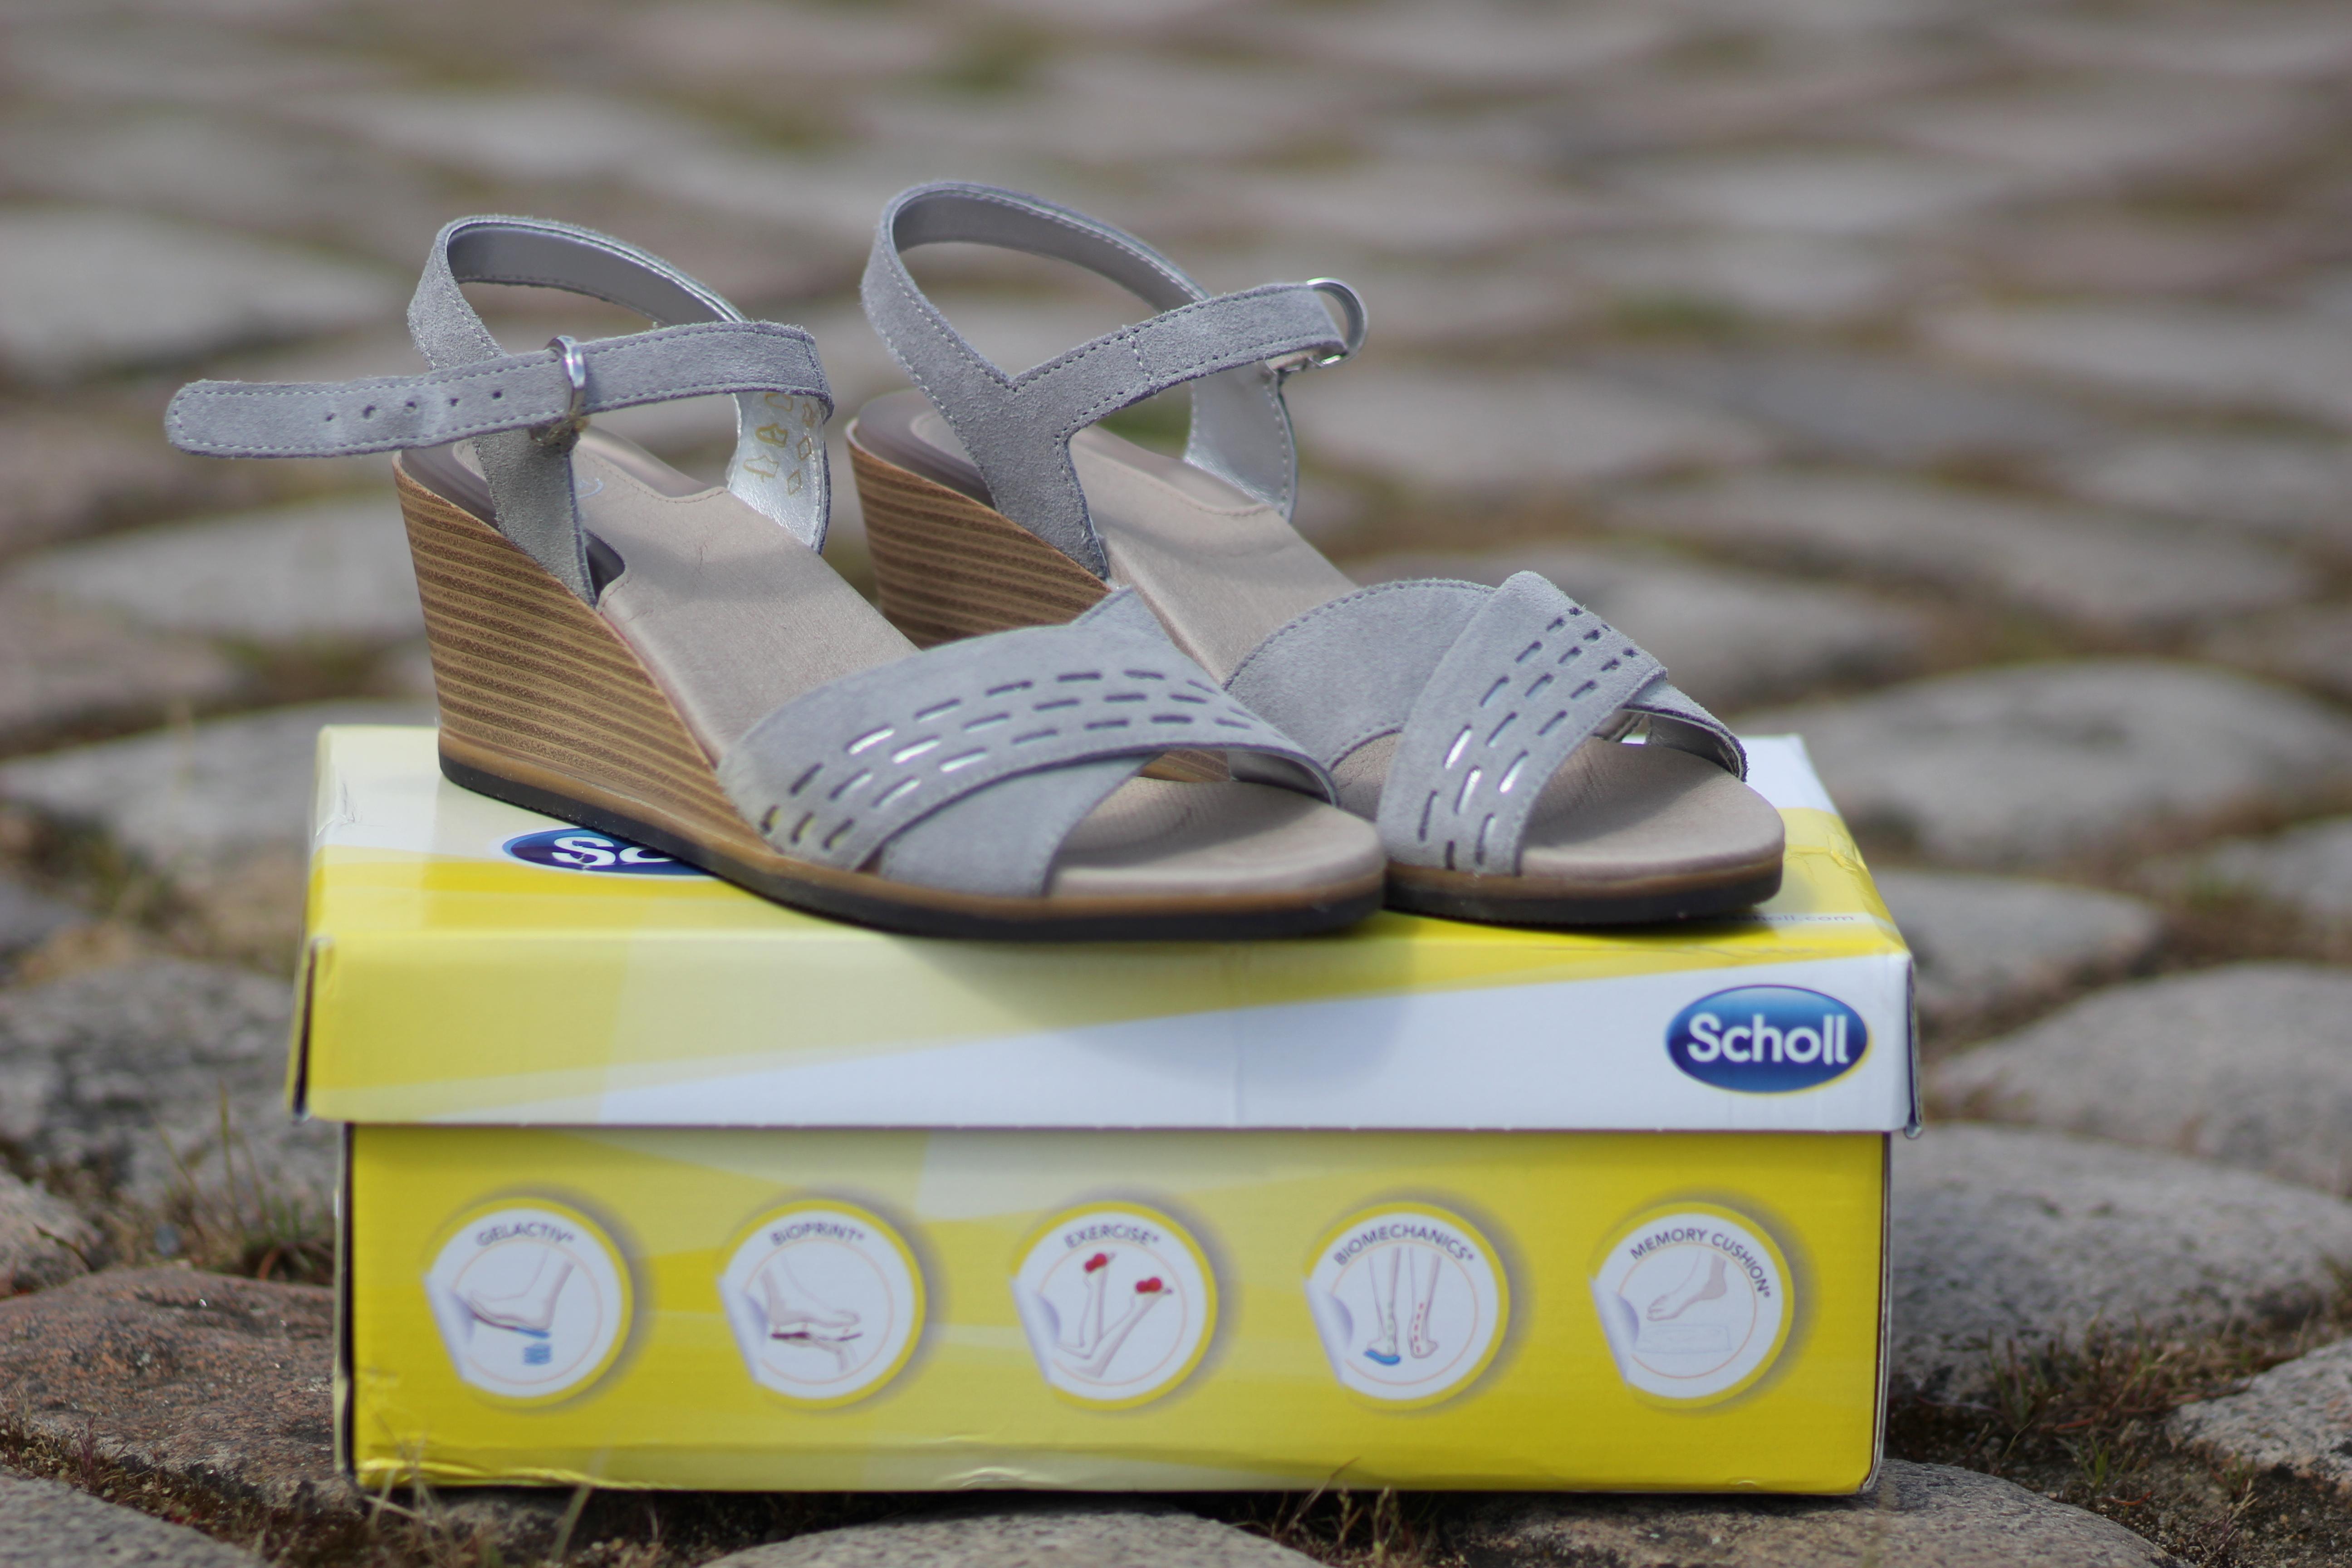 blo,mode,nantais,sandales,scholl  blog_mode_nantes_detail_sandales_scholl_grises